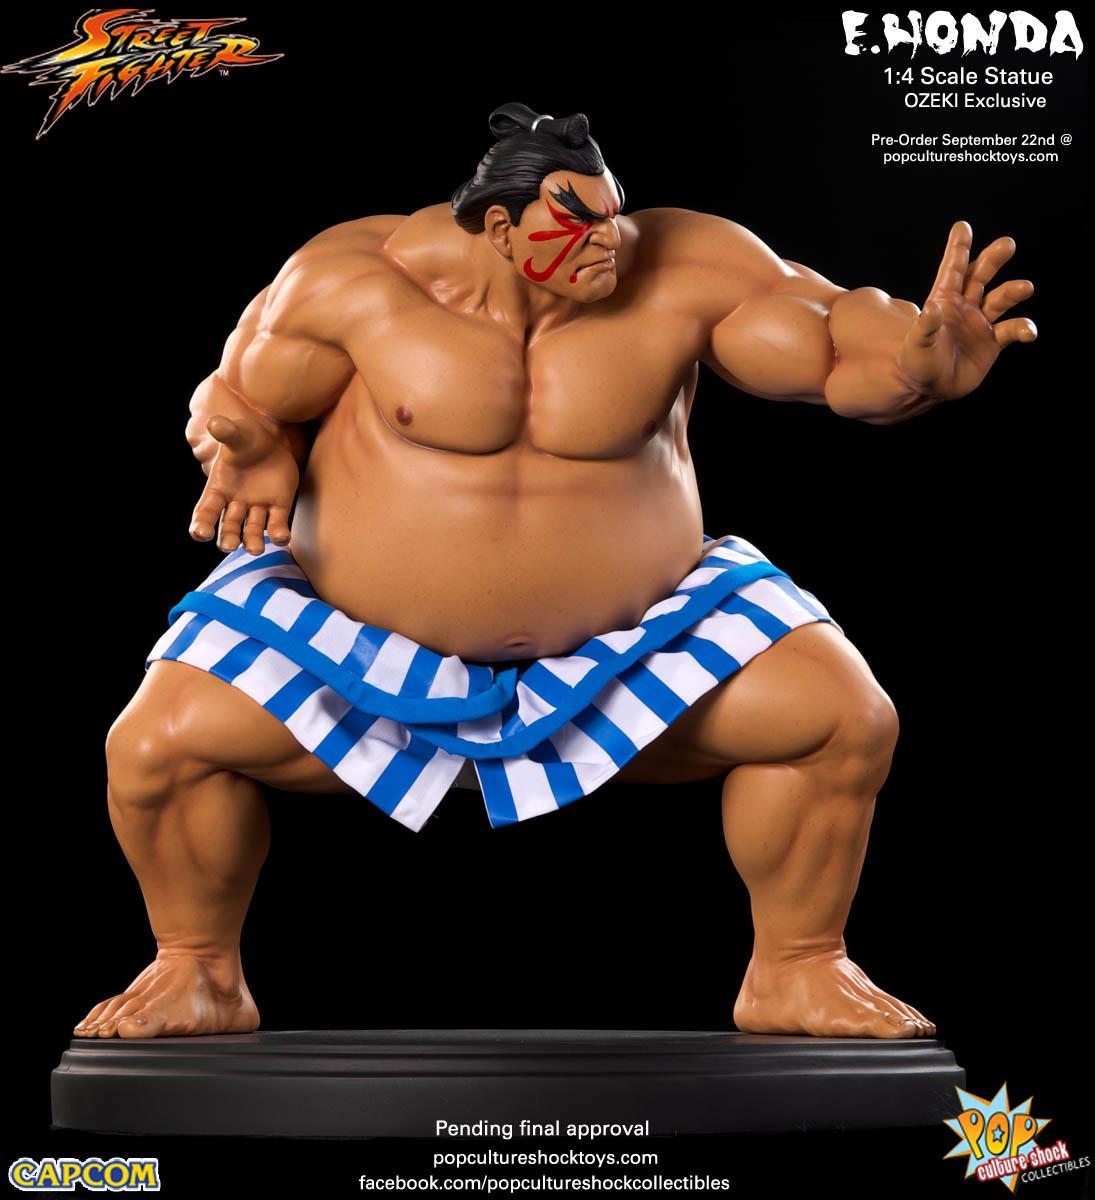 [Pop Culture Shock] Street Fighter: E. Honda 1/4 Statue - Página 3 Street-Fighter-E.-Honda-ozeki-Statue-007